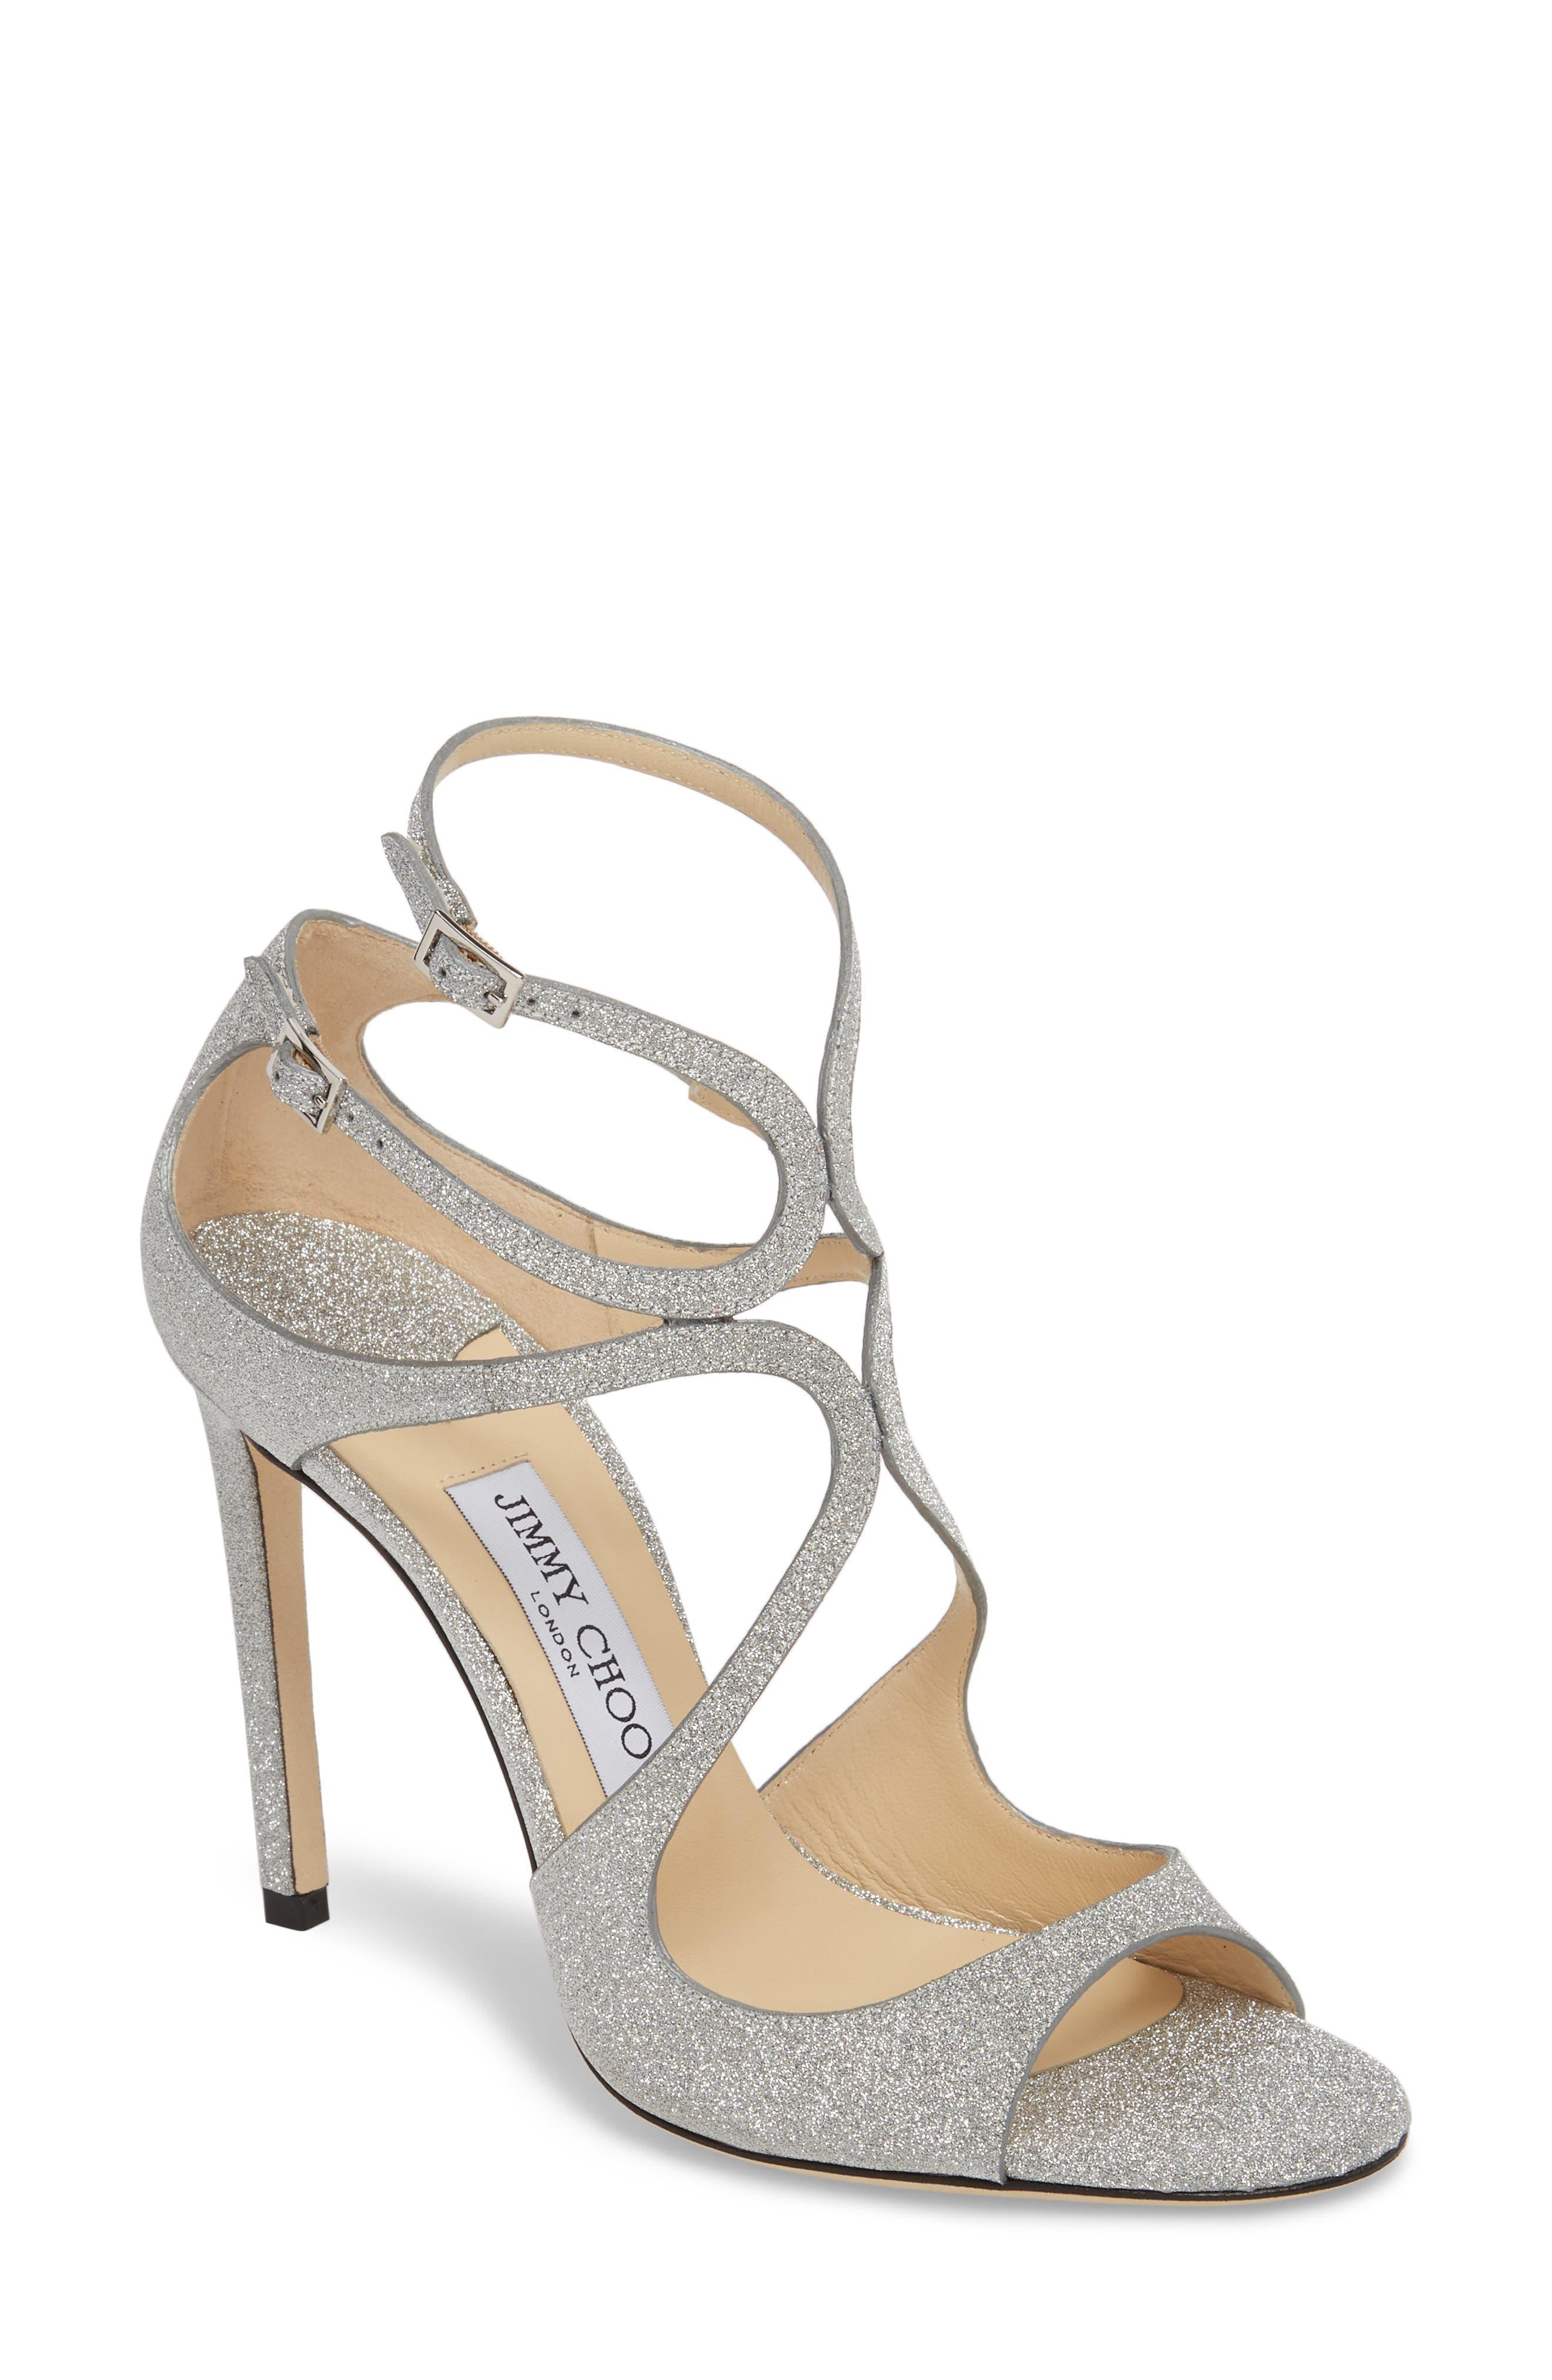 Lang Sandal,                         Main,                         color, SILVER